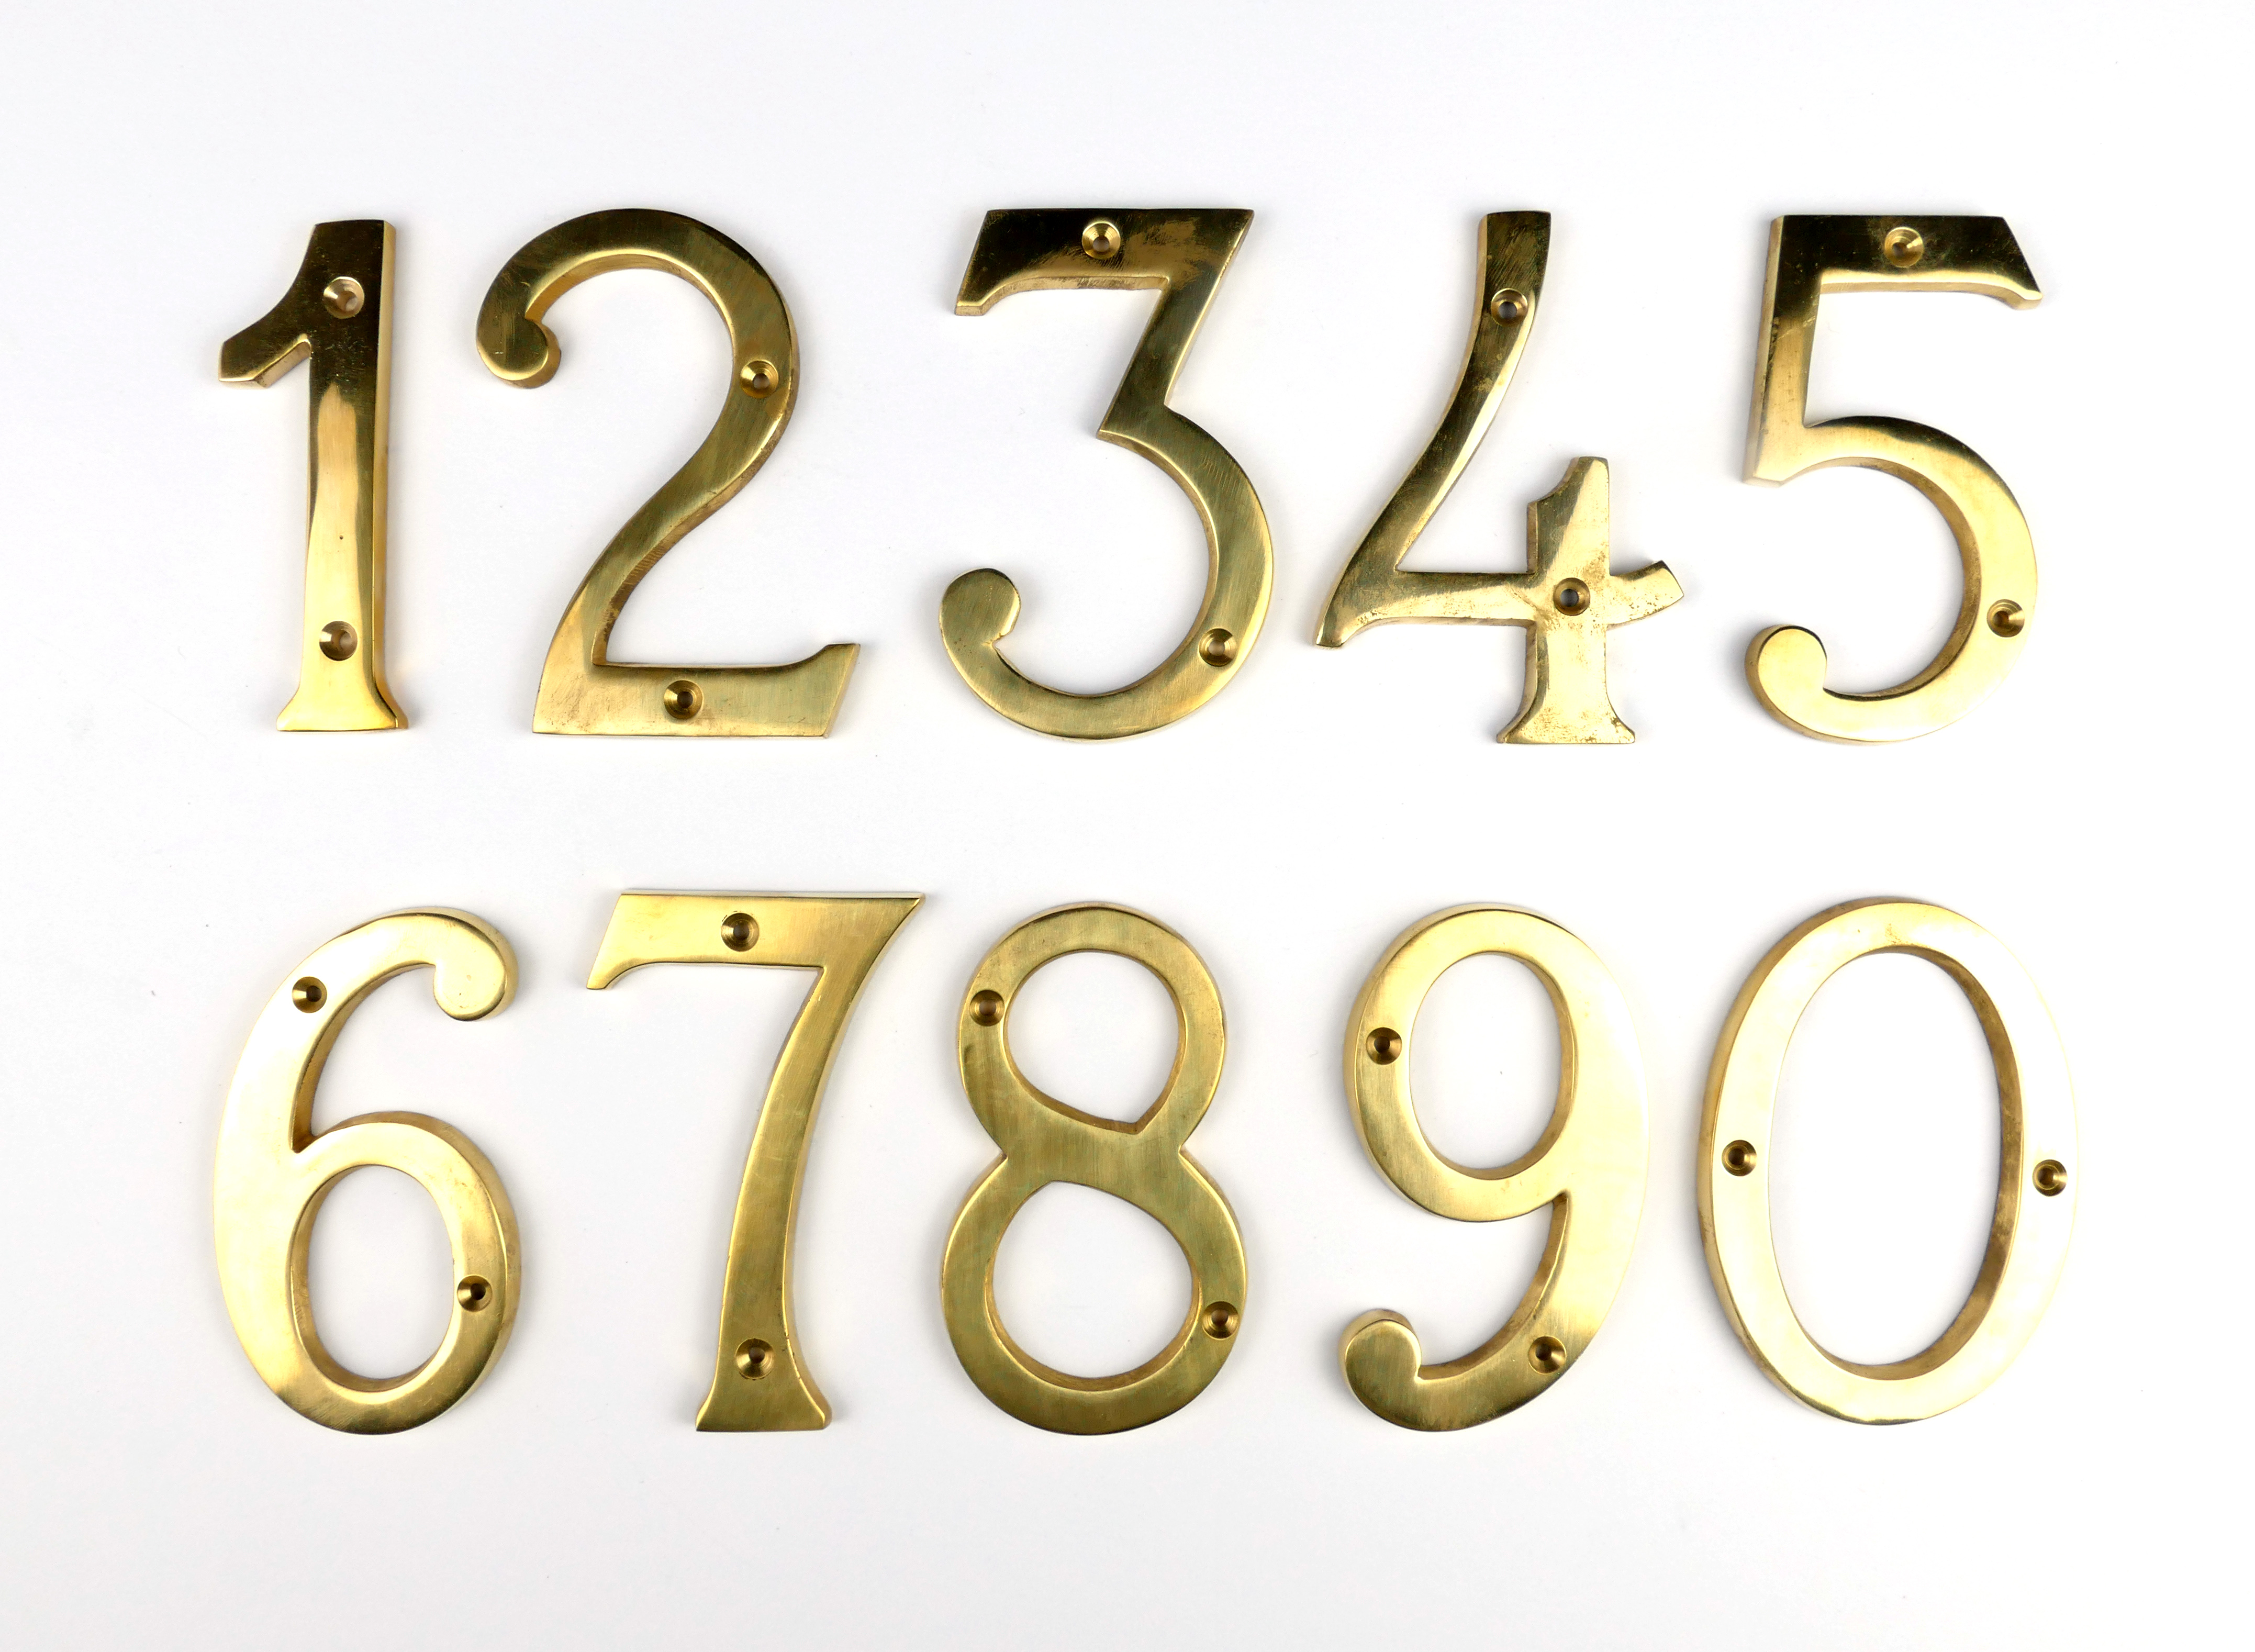 Hausnummer Zimmernummer Messing poliert